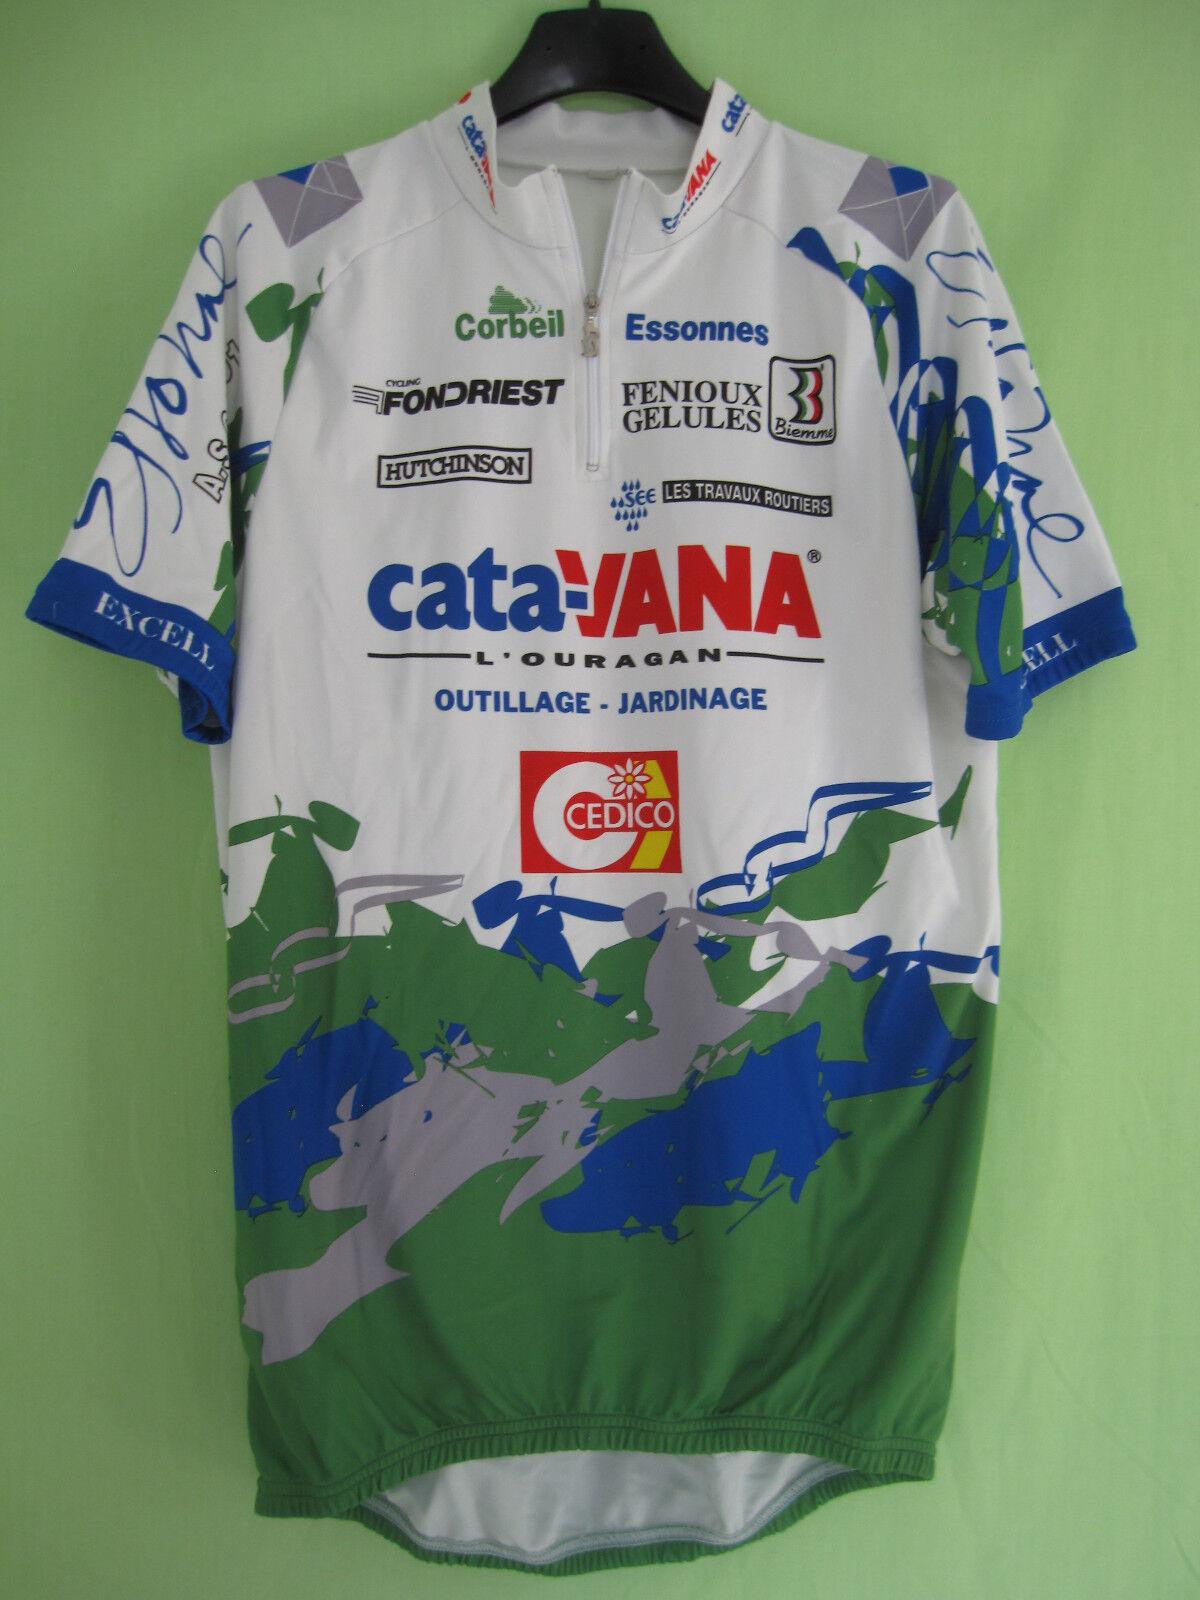 Maillot cycliste Catavana AS Corbeil Essonnes Cedico Tour 1994 Vintage - XXXL